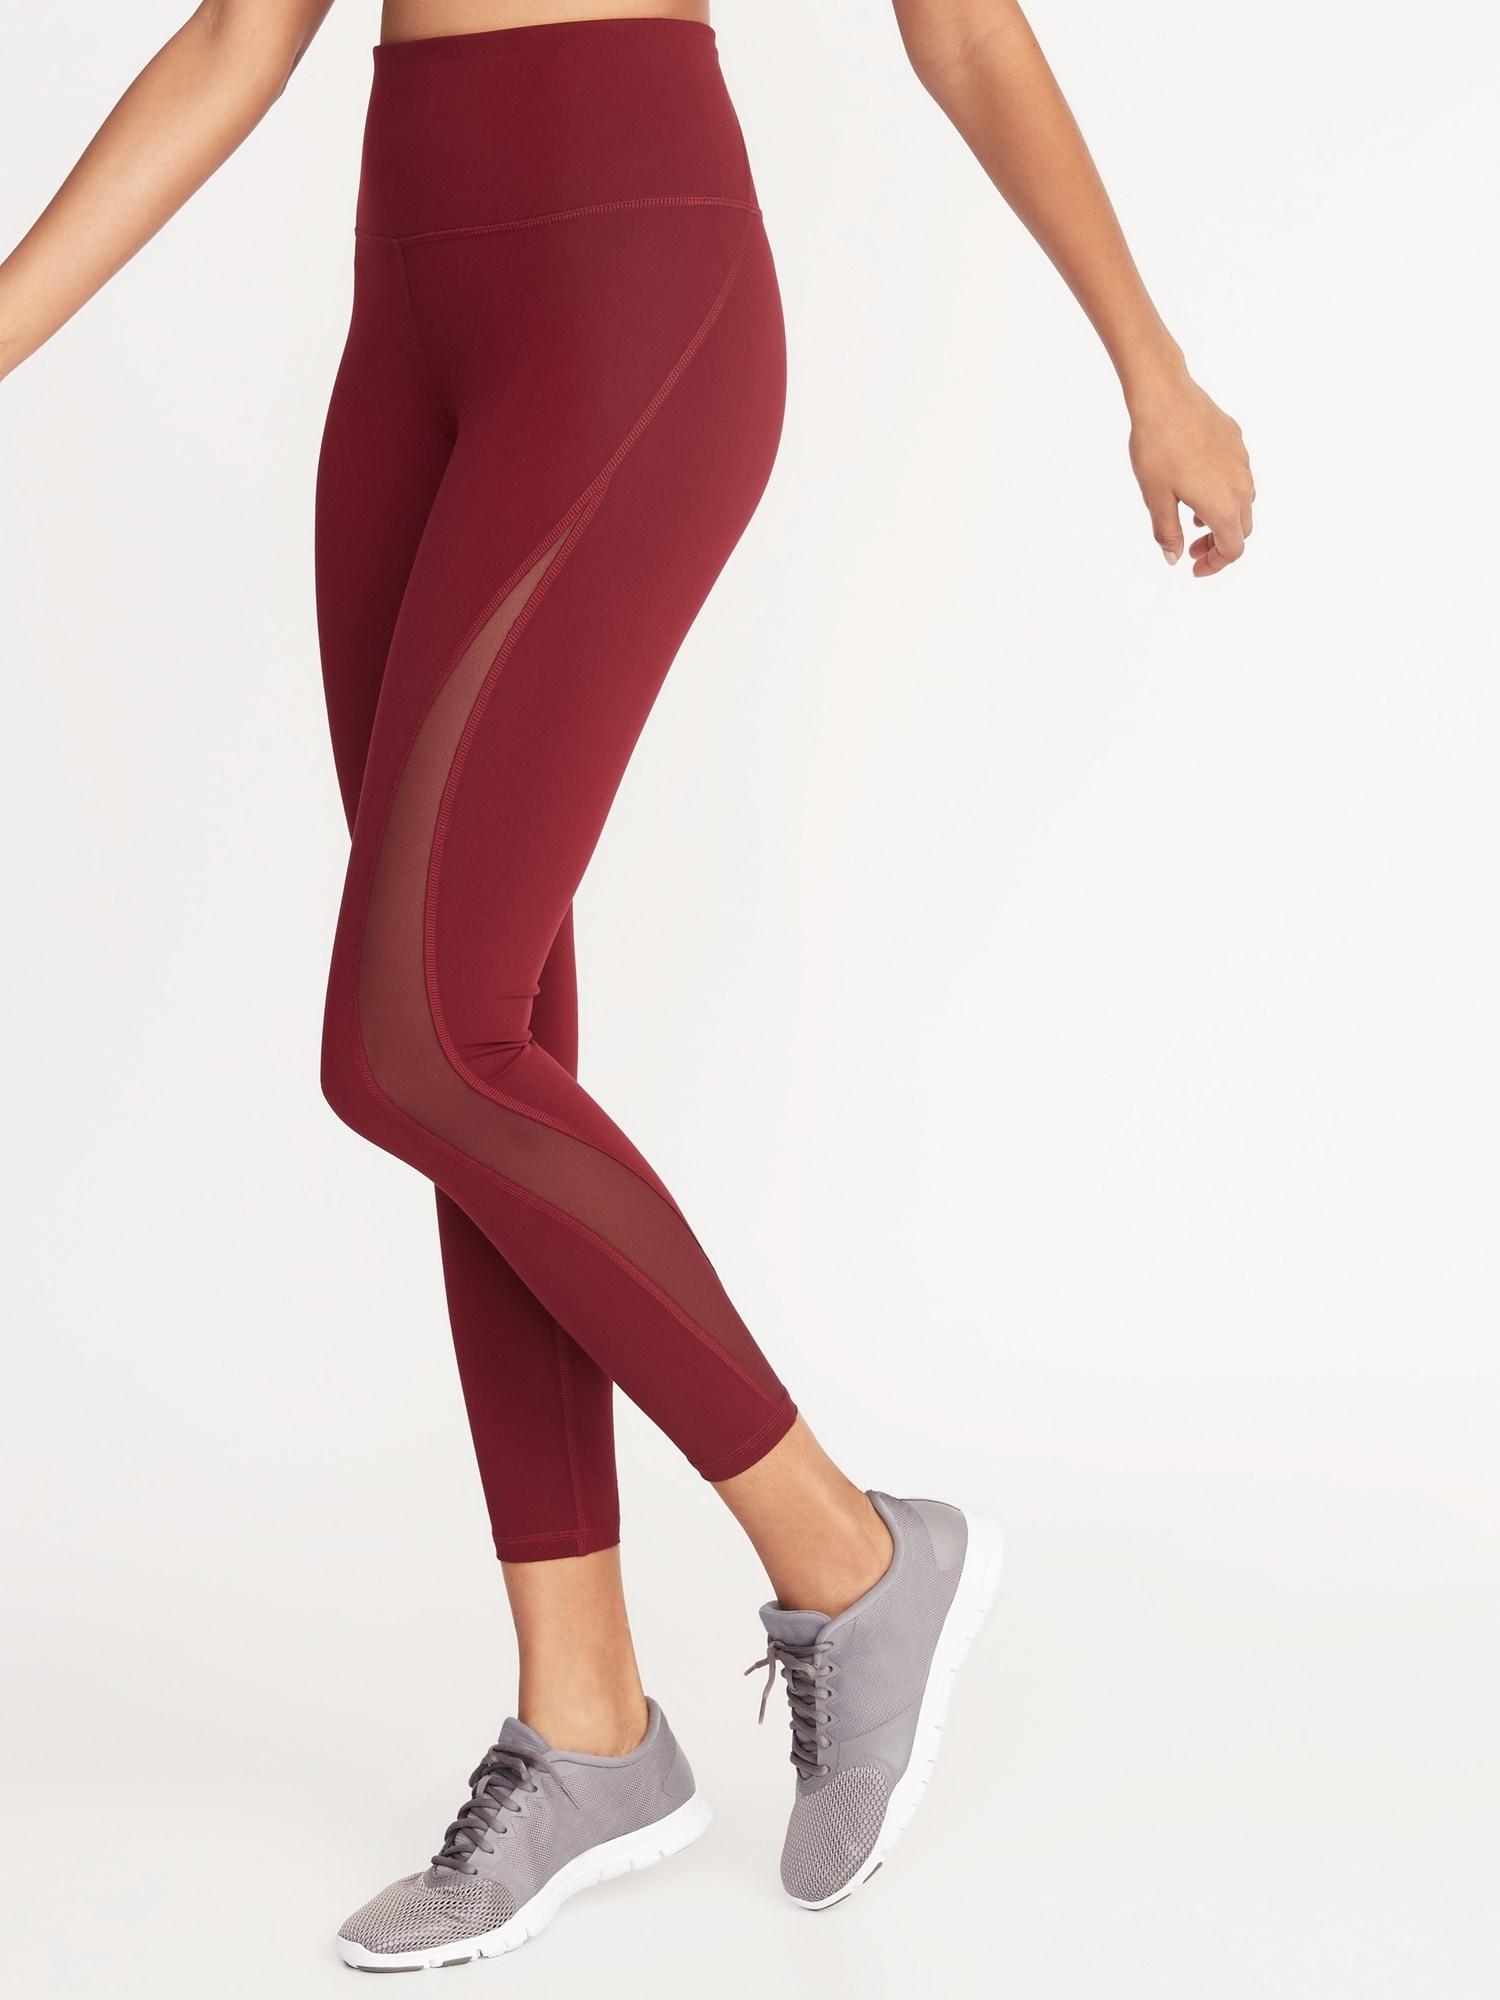 323bd1fe5115b3 High-Rise Elevate 7/8-Length Mesh-Trim Compression Leggings for Women